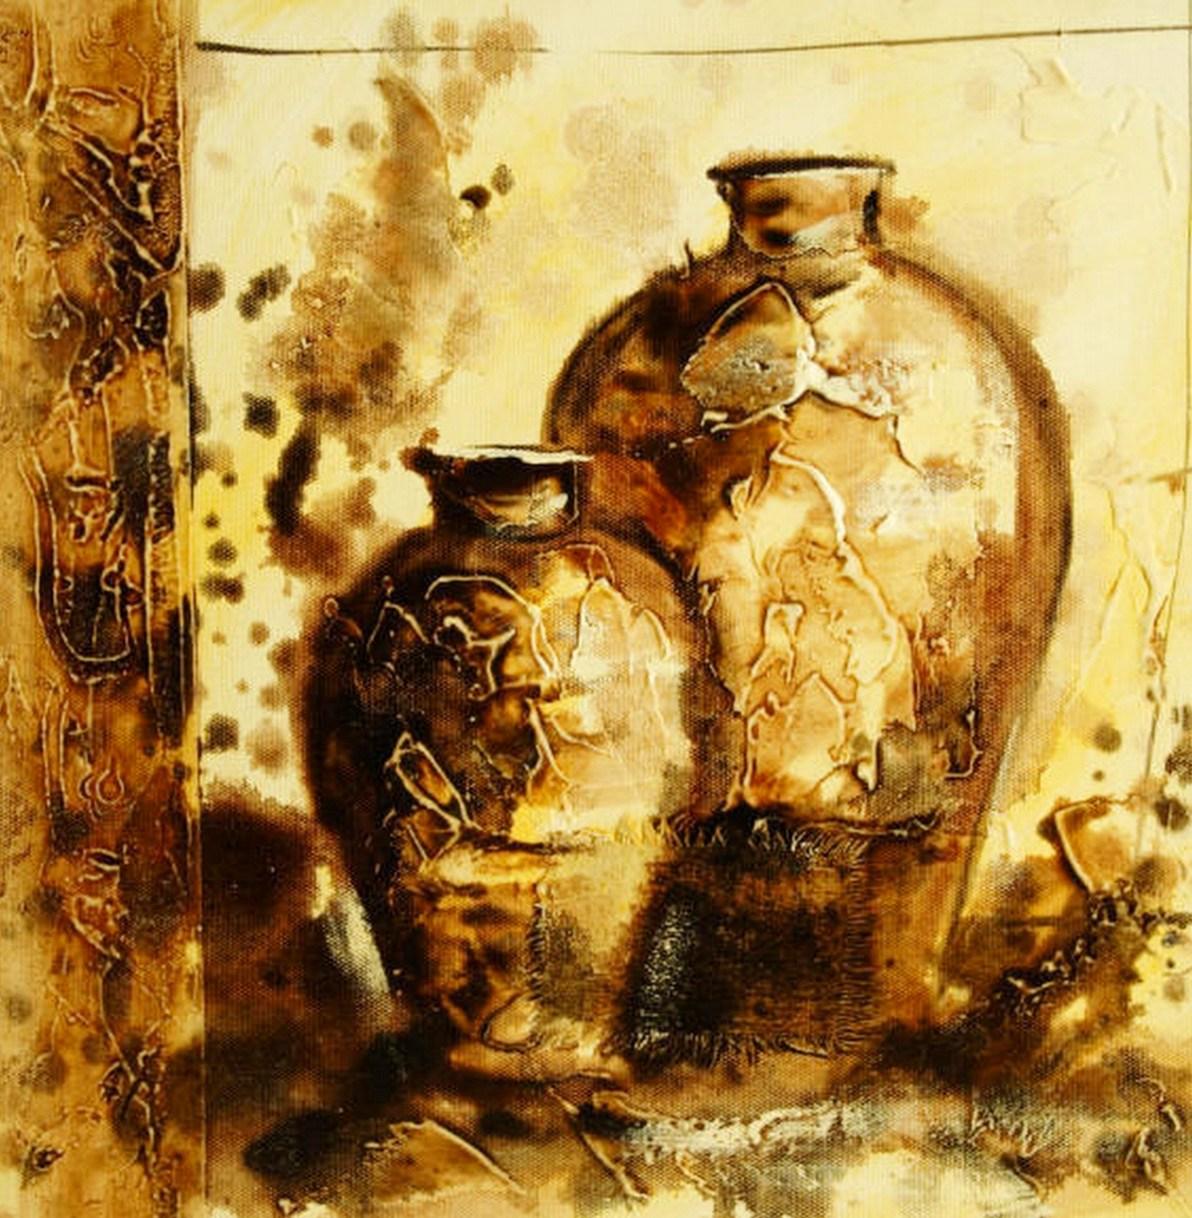 Im genes arte pinturas bodegones modernos - Cuadros bodegones modernos ...